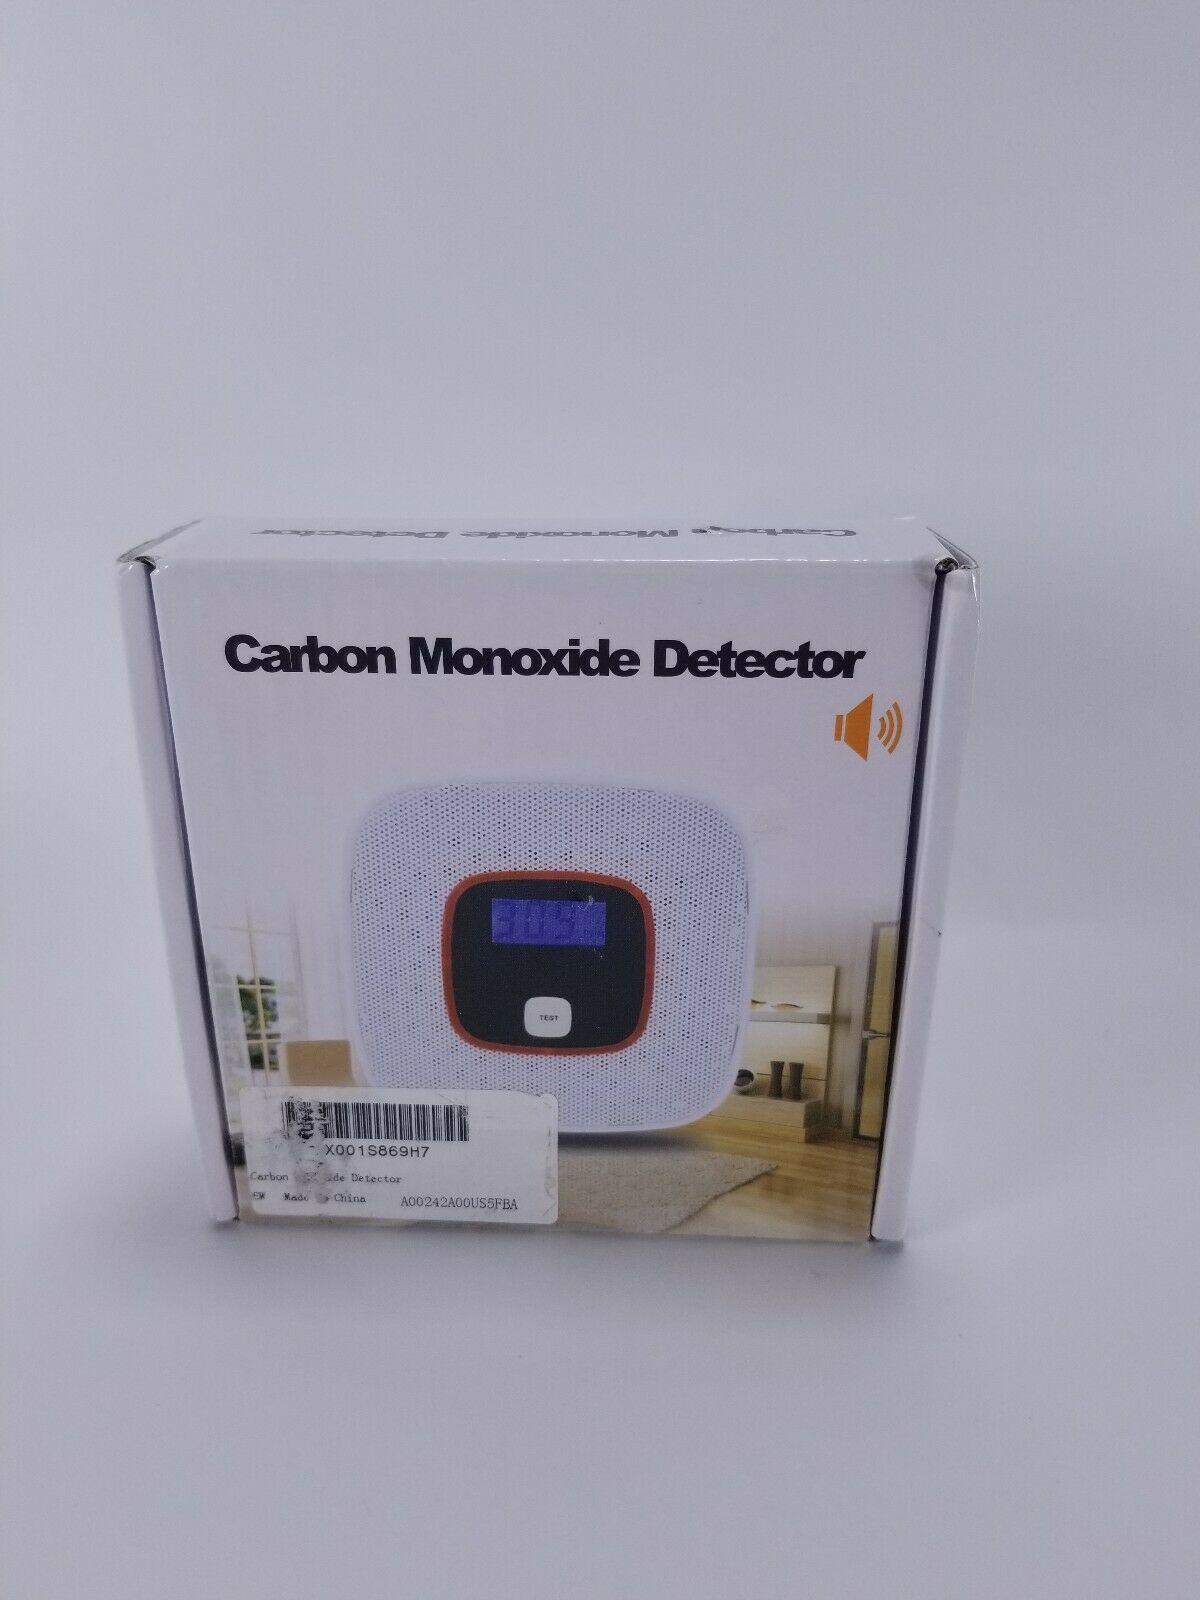 Smoke Alarm Smoke Alarm Ideas Smokealarm Firealarm Combination Carbon Monoxide And Smoke Alarm Battery Operate Co Smoke Alarms Smoke Detector Fire Alarm